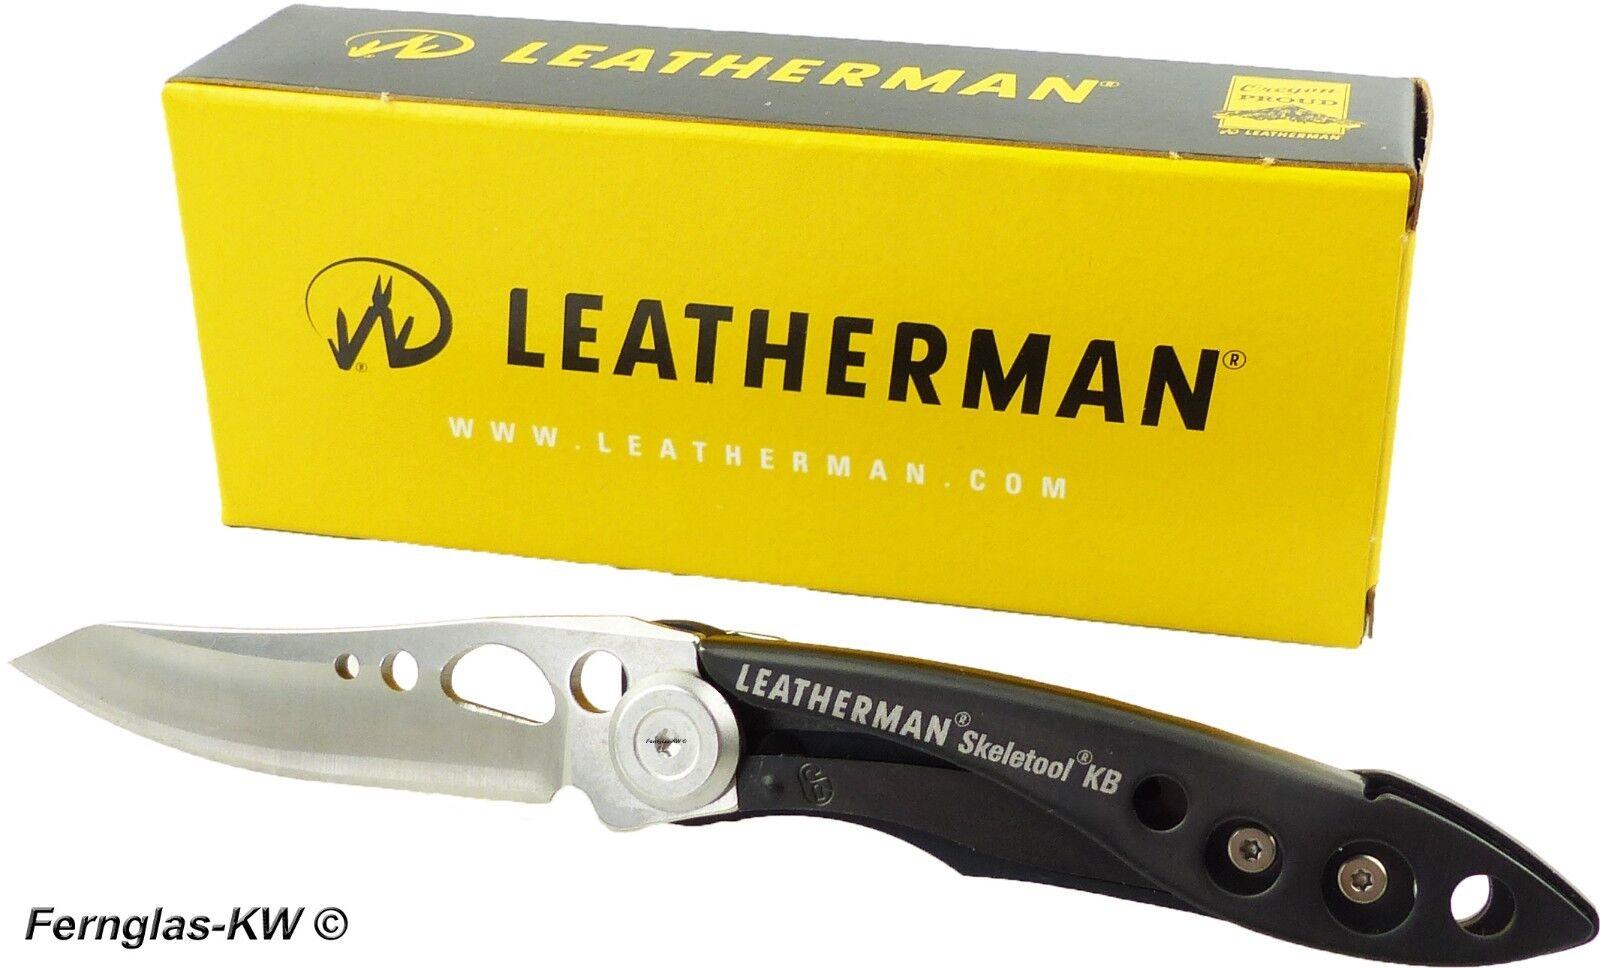 Leatherman Outdoor Taschenmesser SKELETOOL KB in black mit glatter Klinge